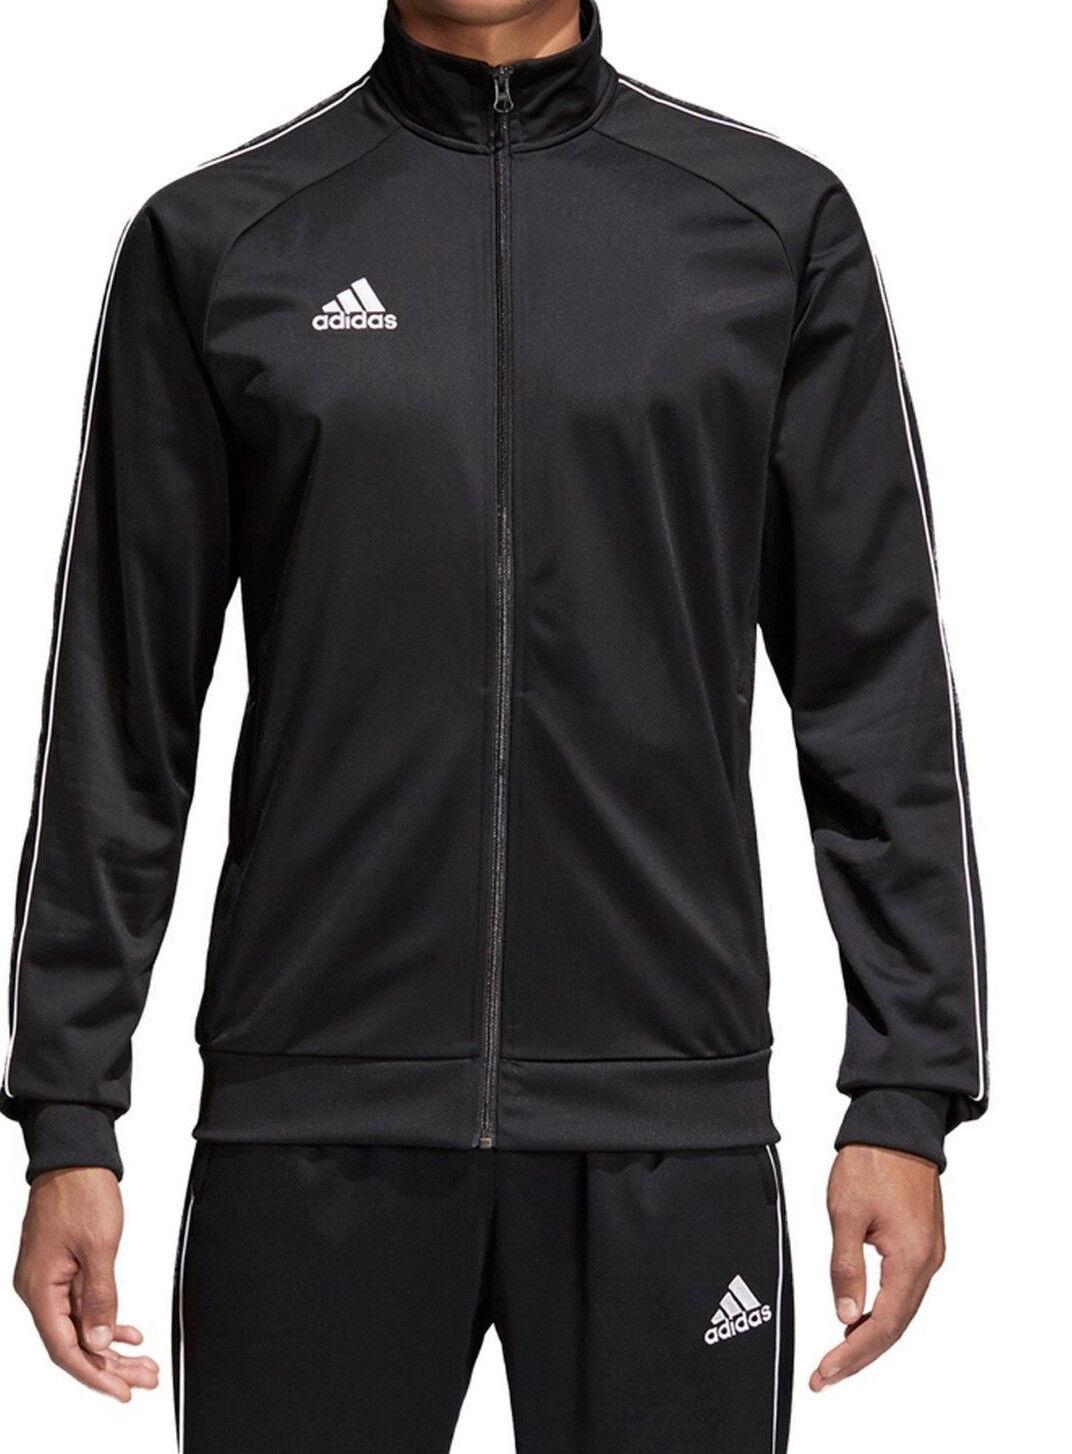 Adidas Core 18 Herren Trainingsanzug Fußball Sport Jogginga ...